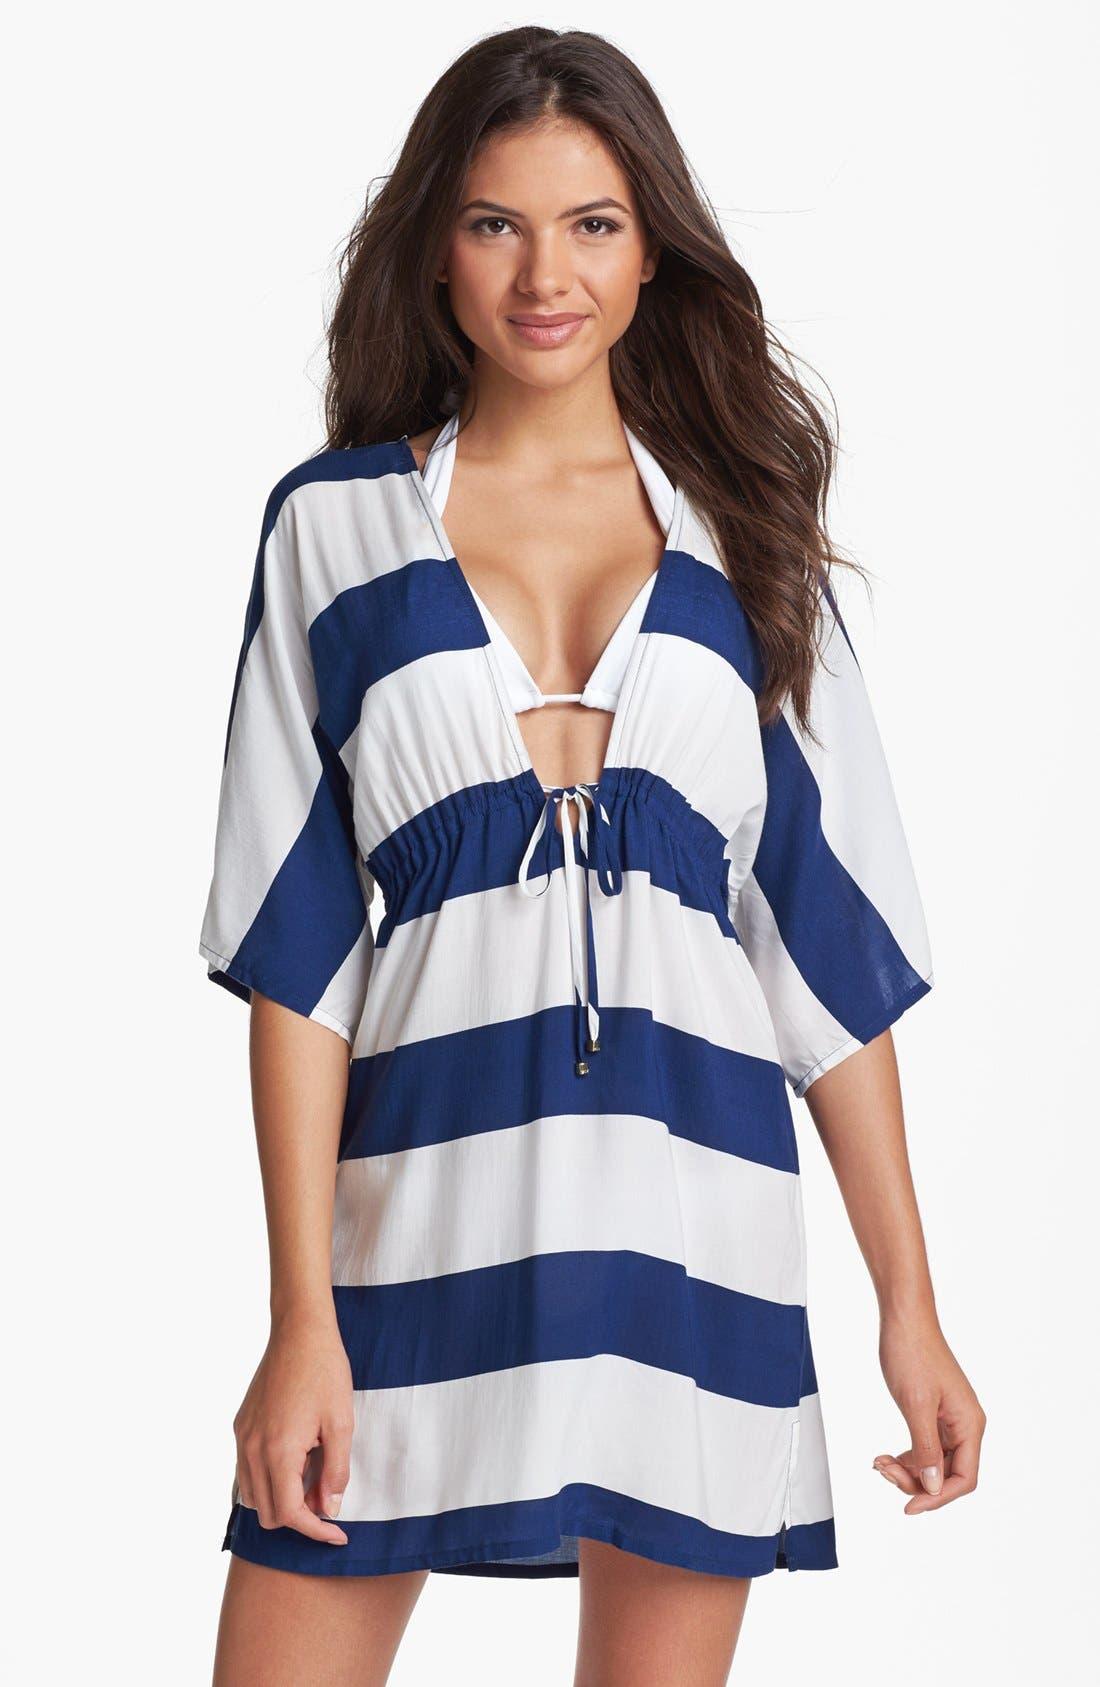 Alternate Image 1 Selected - ViX Swimwear 'Malawi San Diego' Caftan